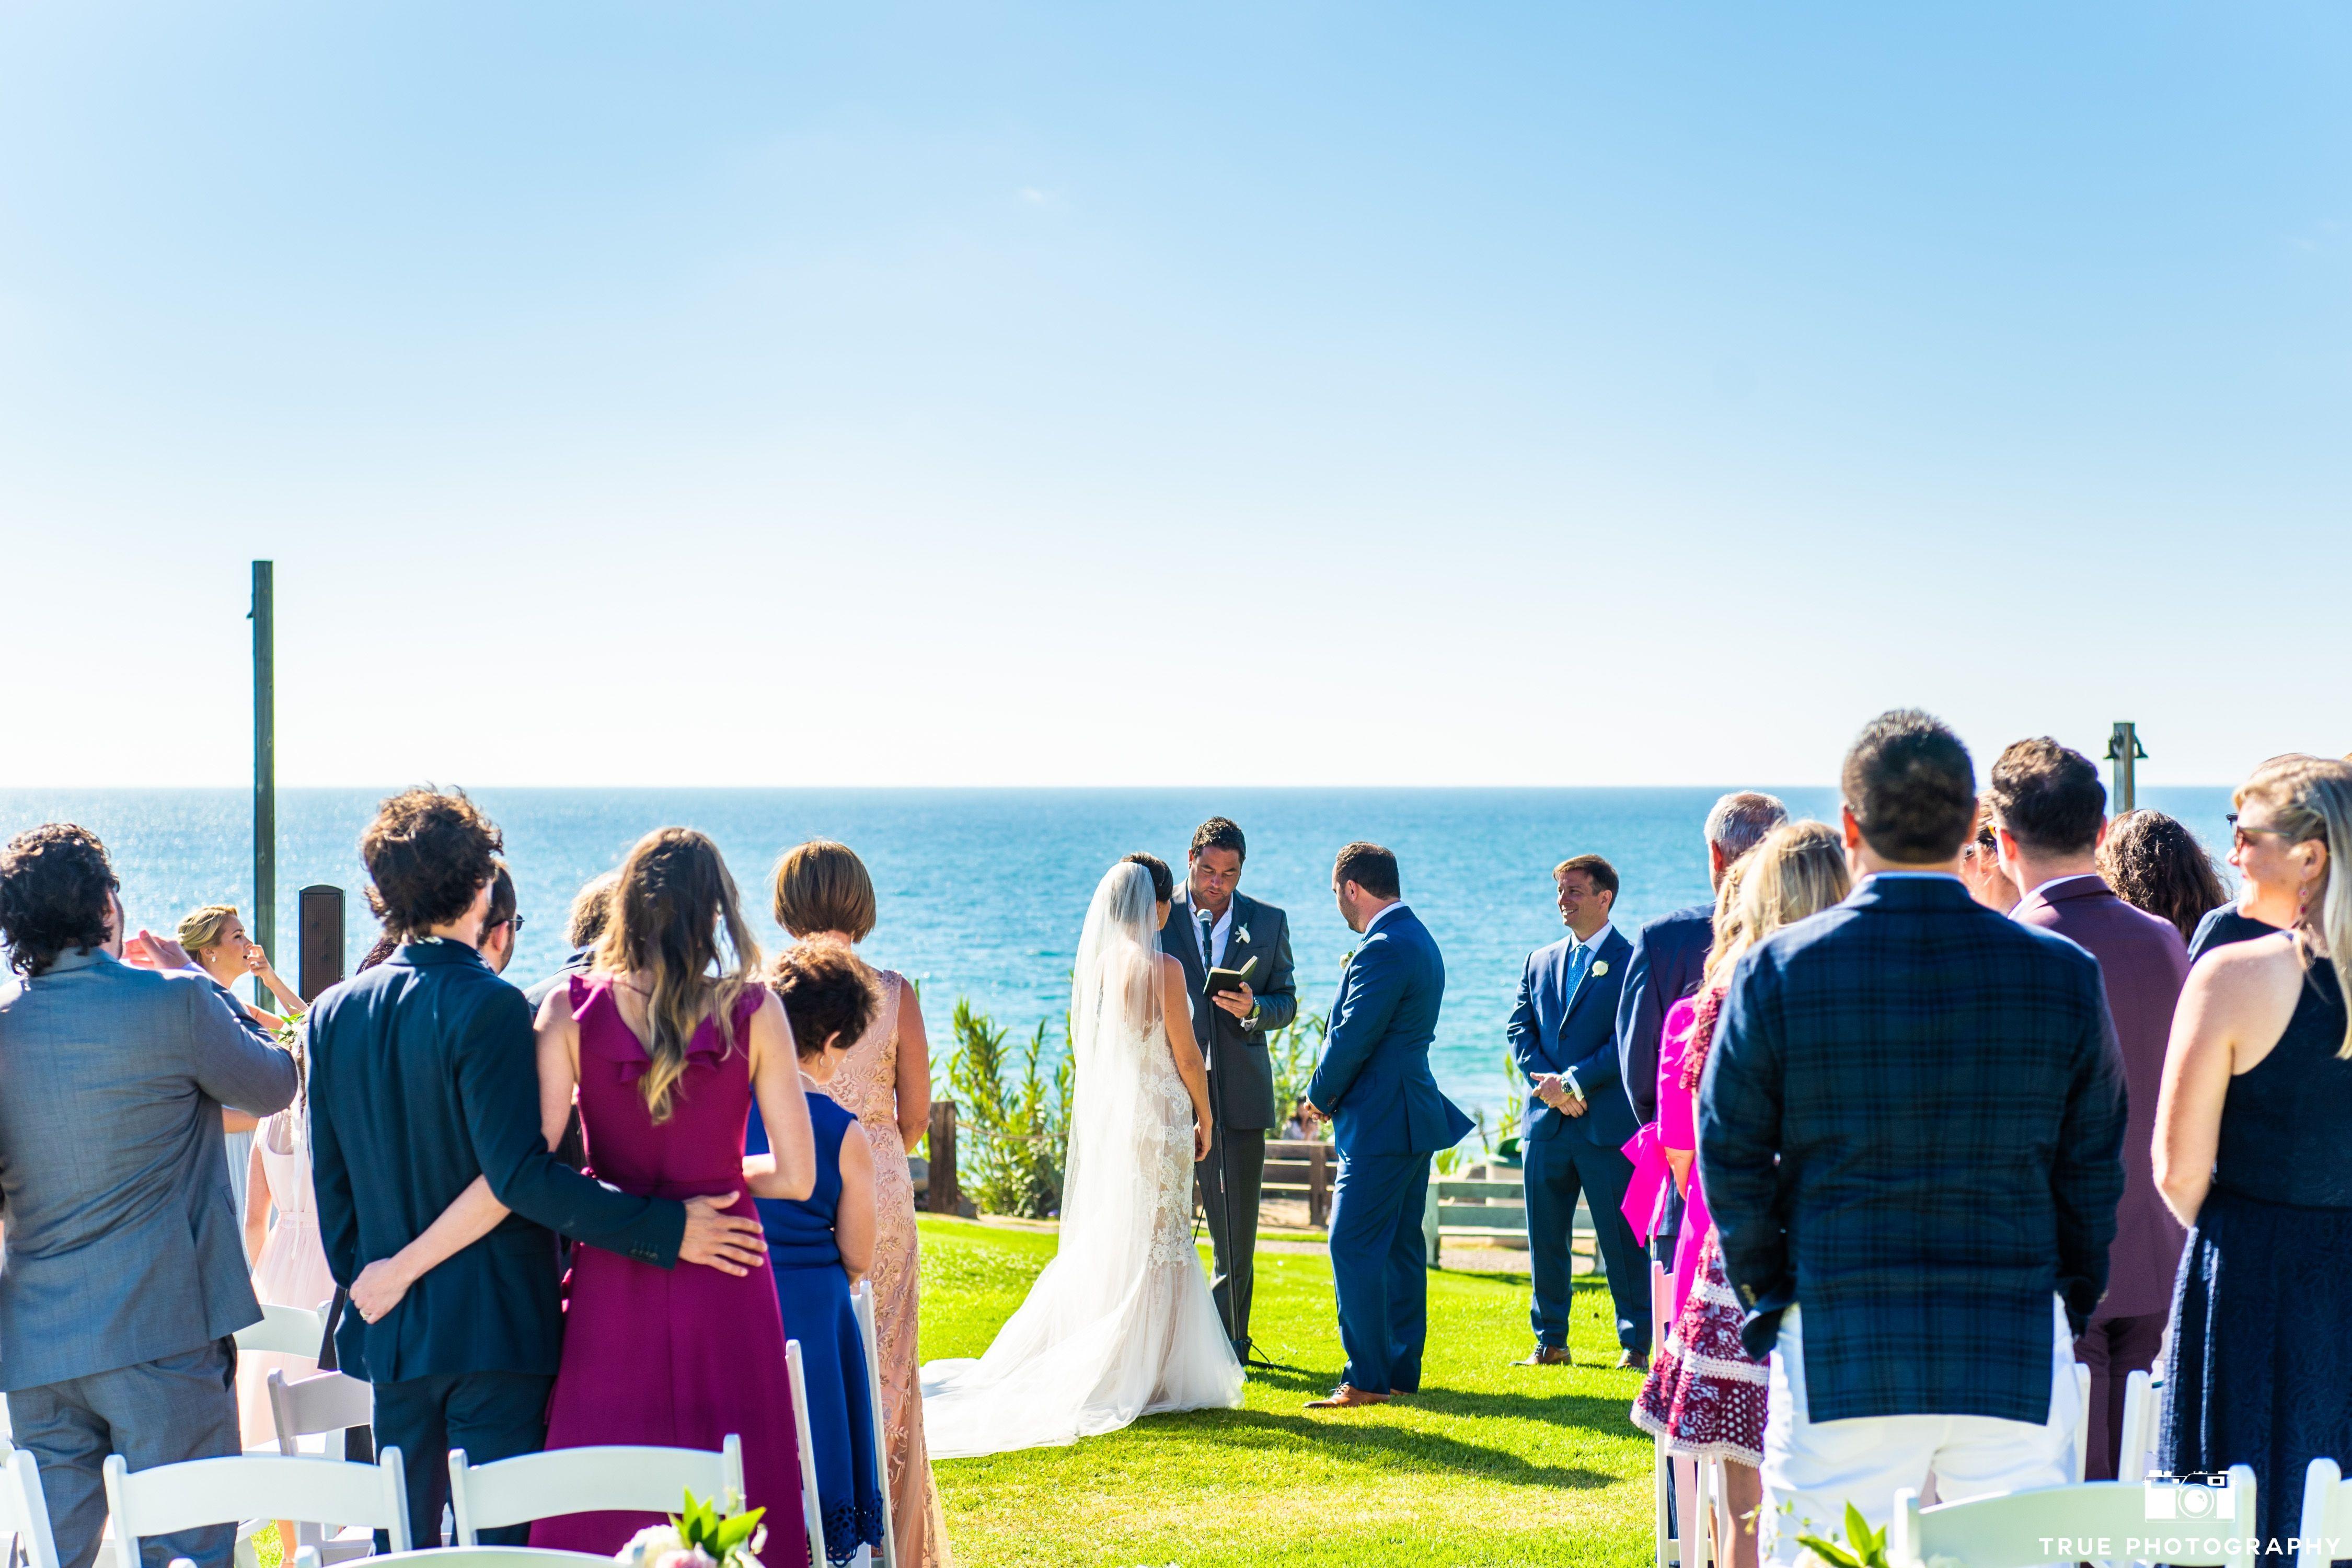 Beach wedding spots  Pin by LuAuberge Del Mar on Real LuAuberge Weddings  Pinterest